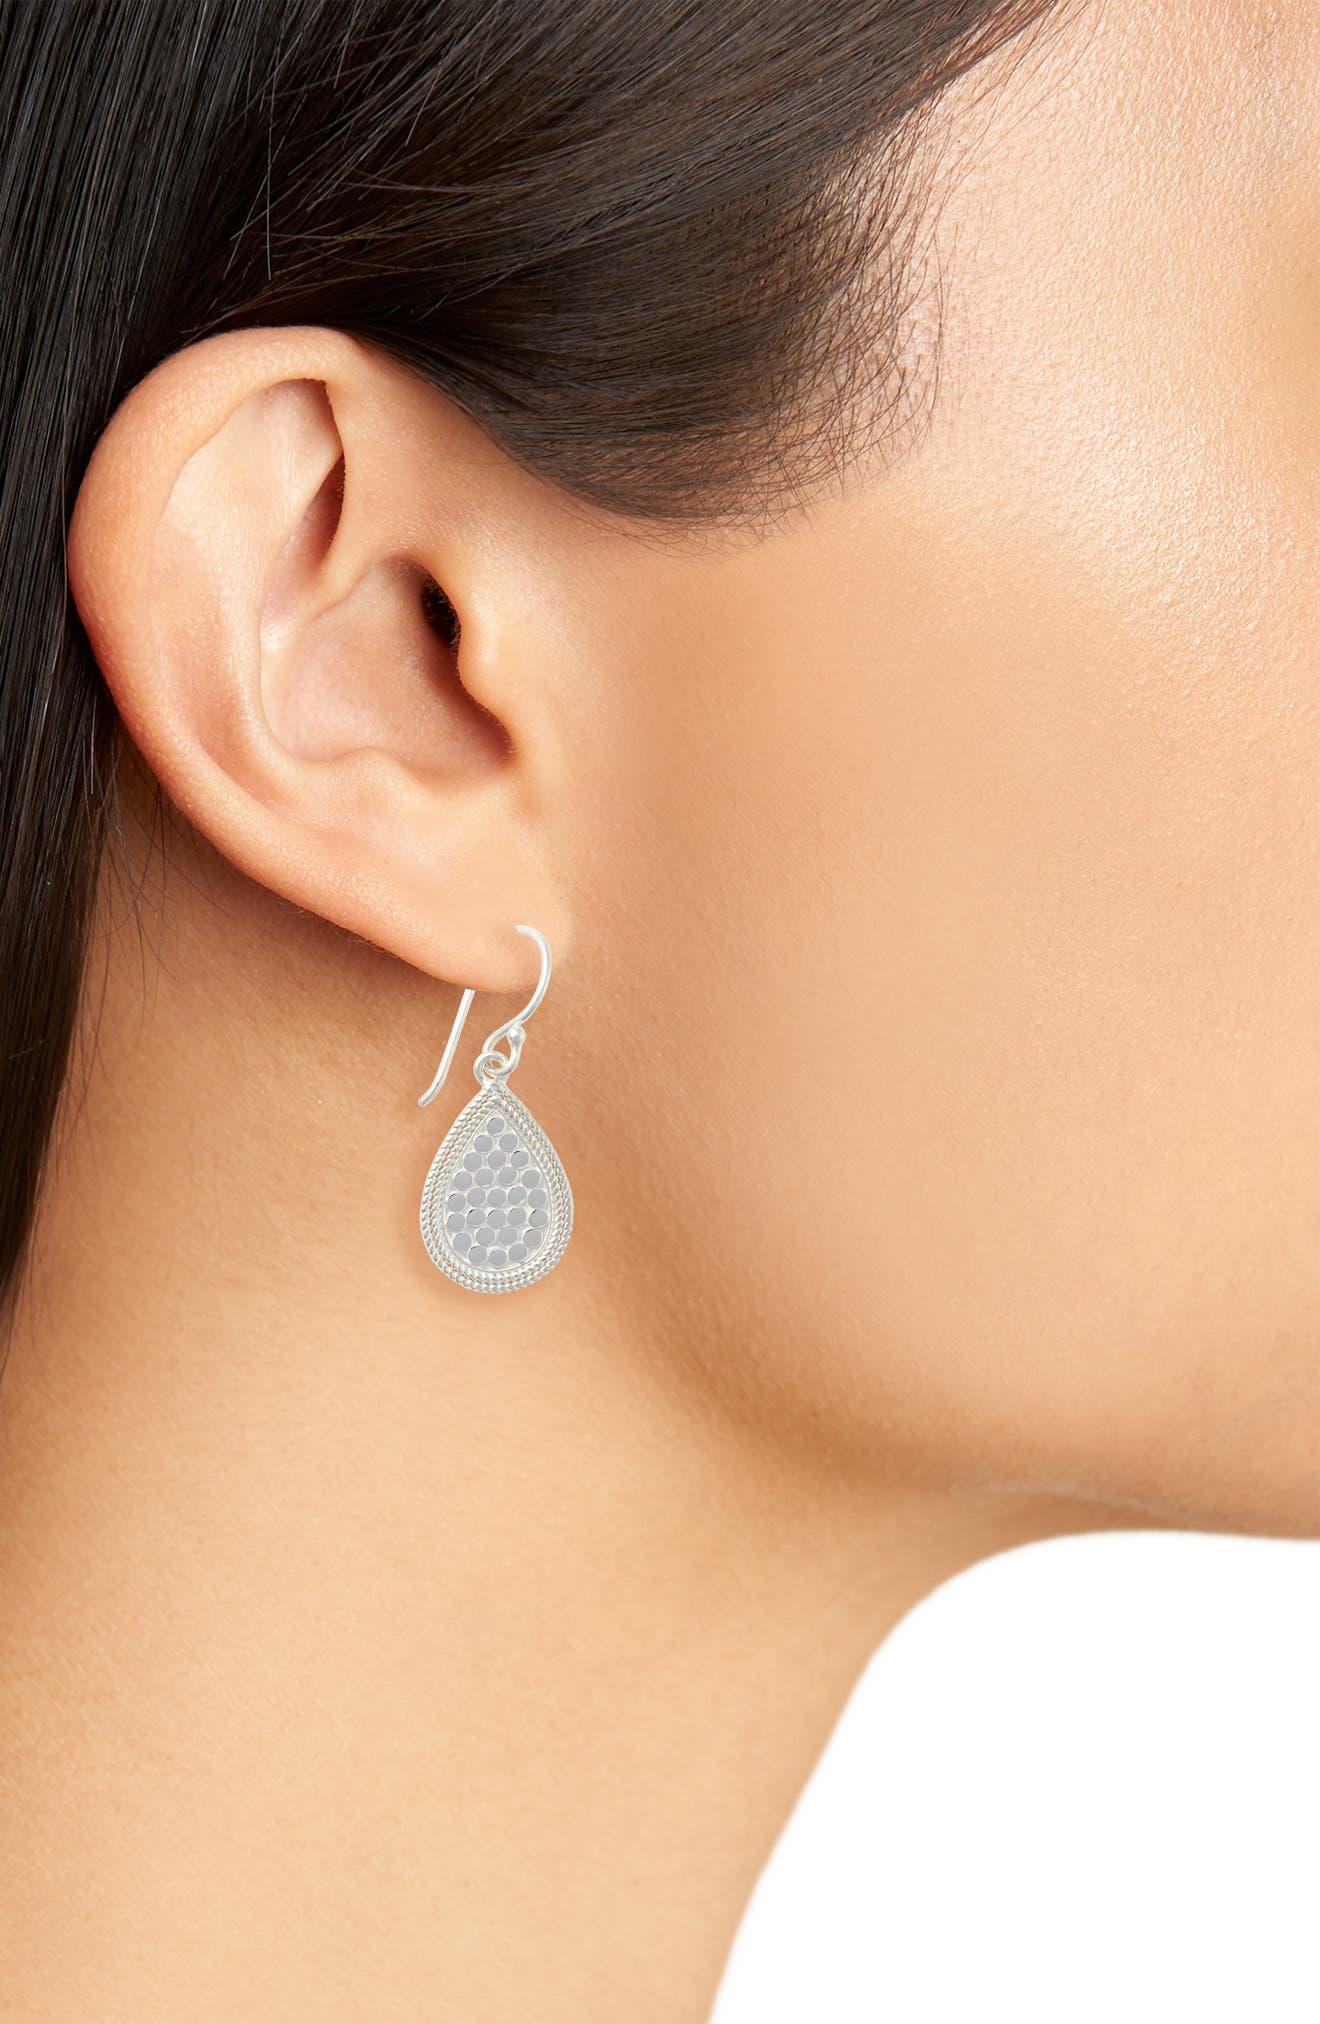 'Gili' Small Teardrop Earrings,                             Alternate thumbnail 3, color,                             SILVER